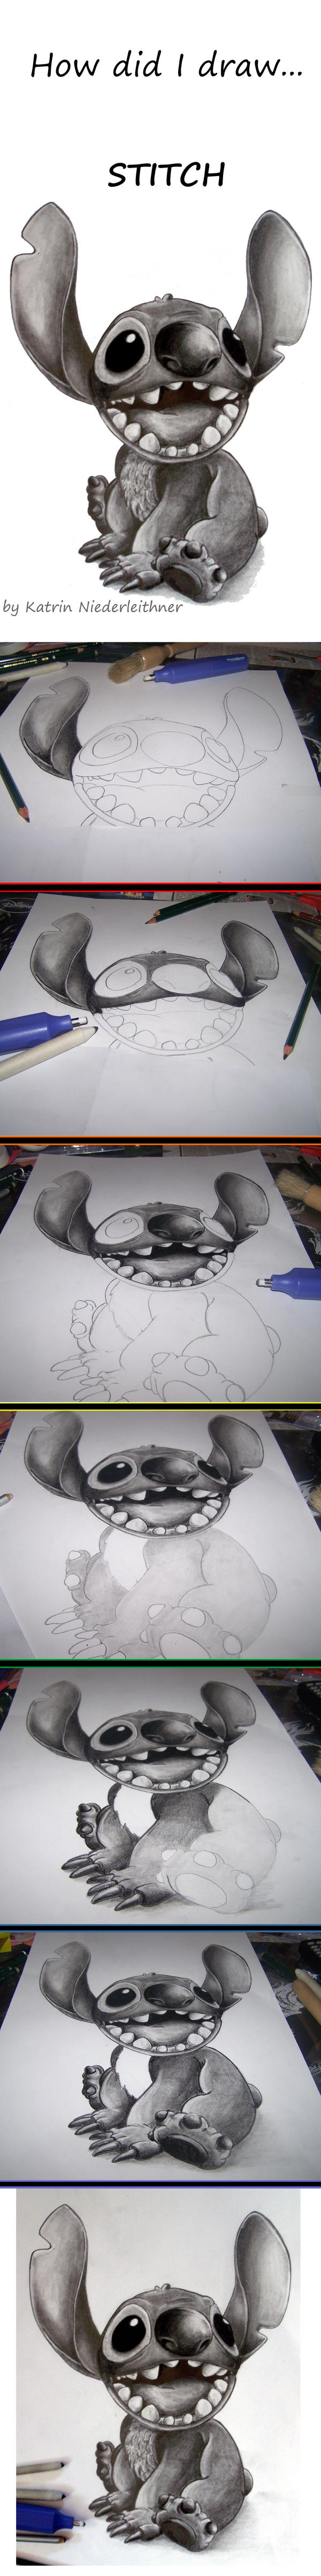 How did I draw... STITCH by Cathy86